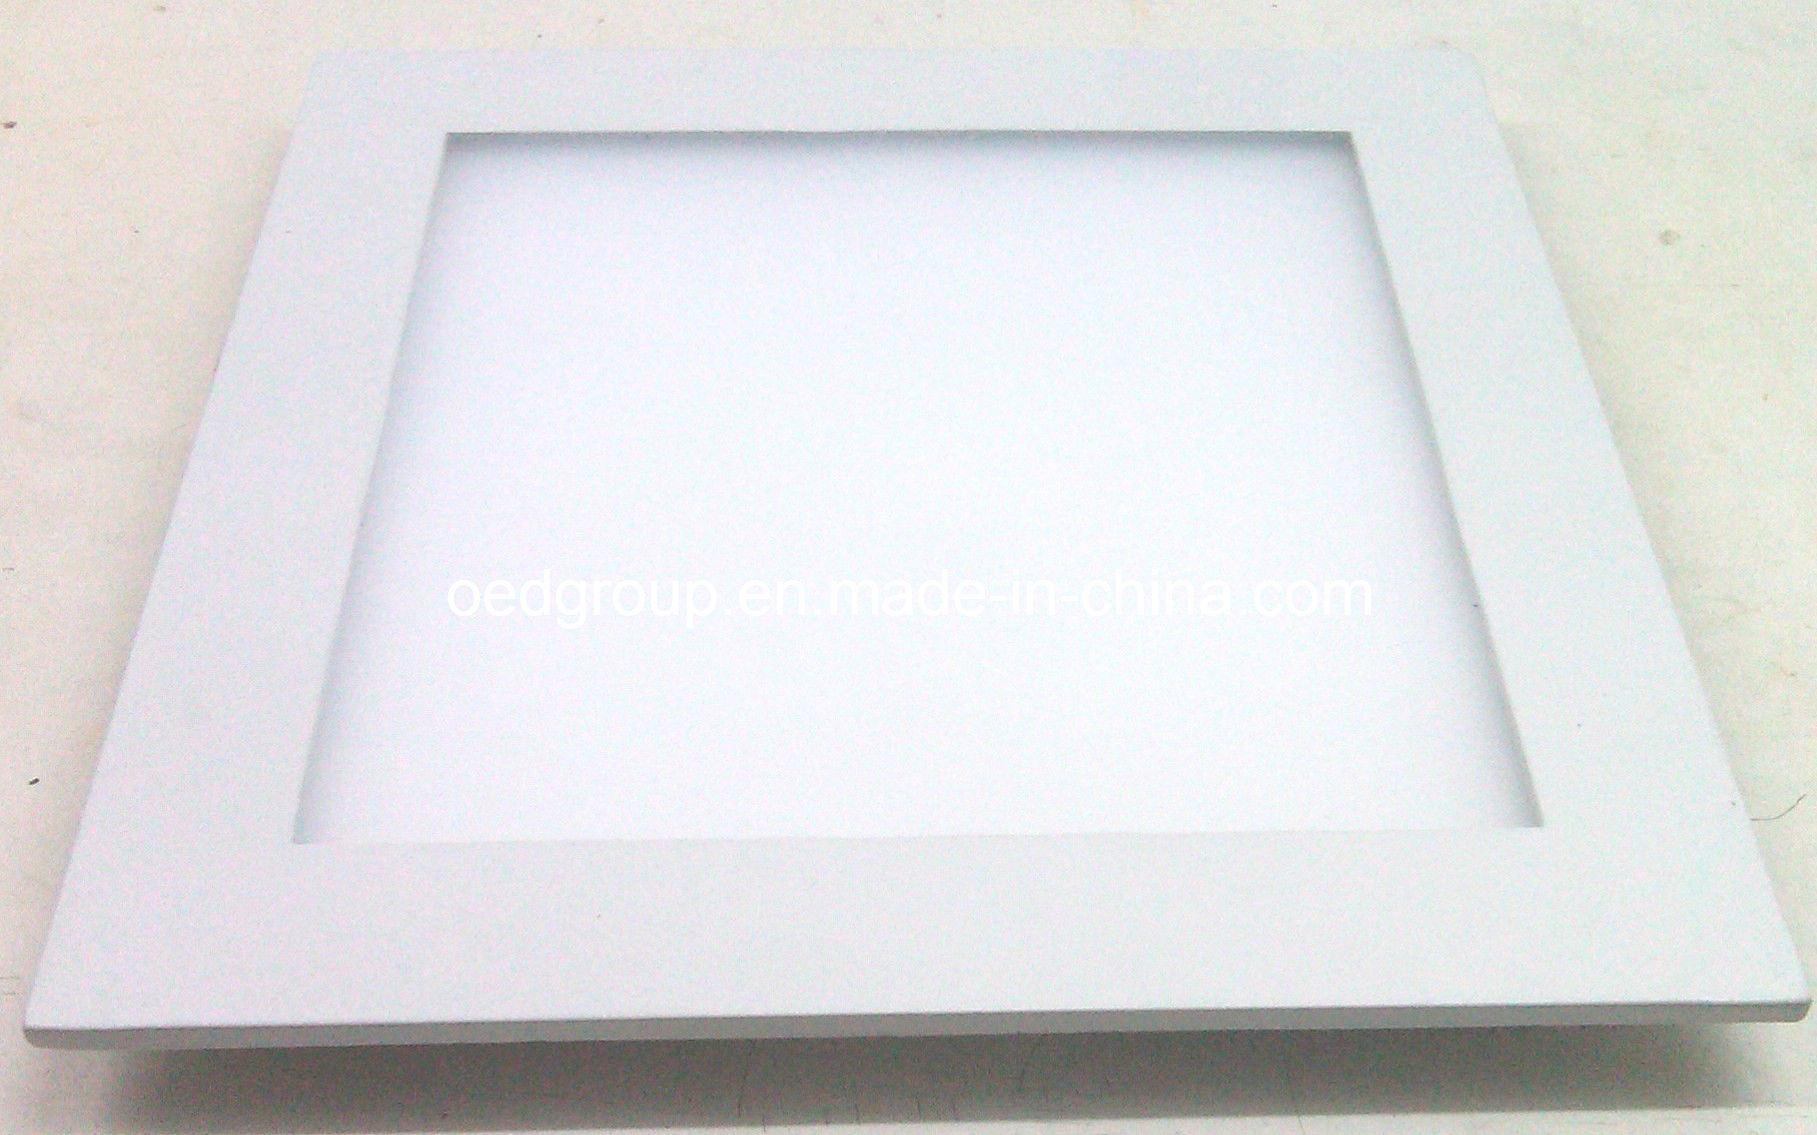 Untra Thin 300*300mm 24W LED Panel Lamp